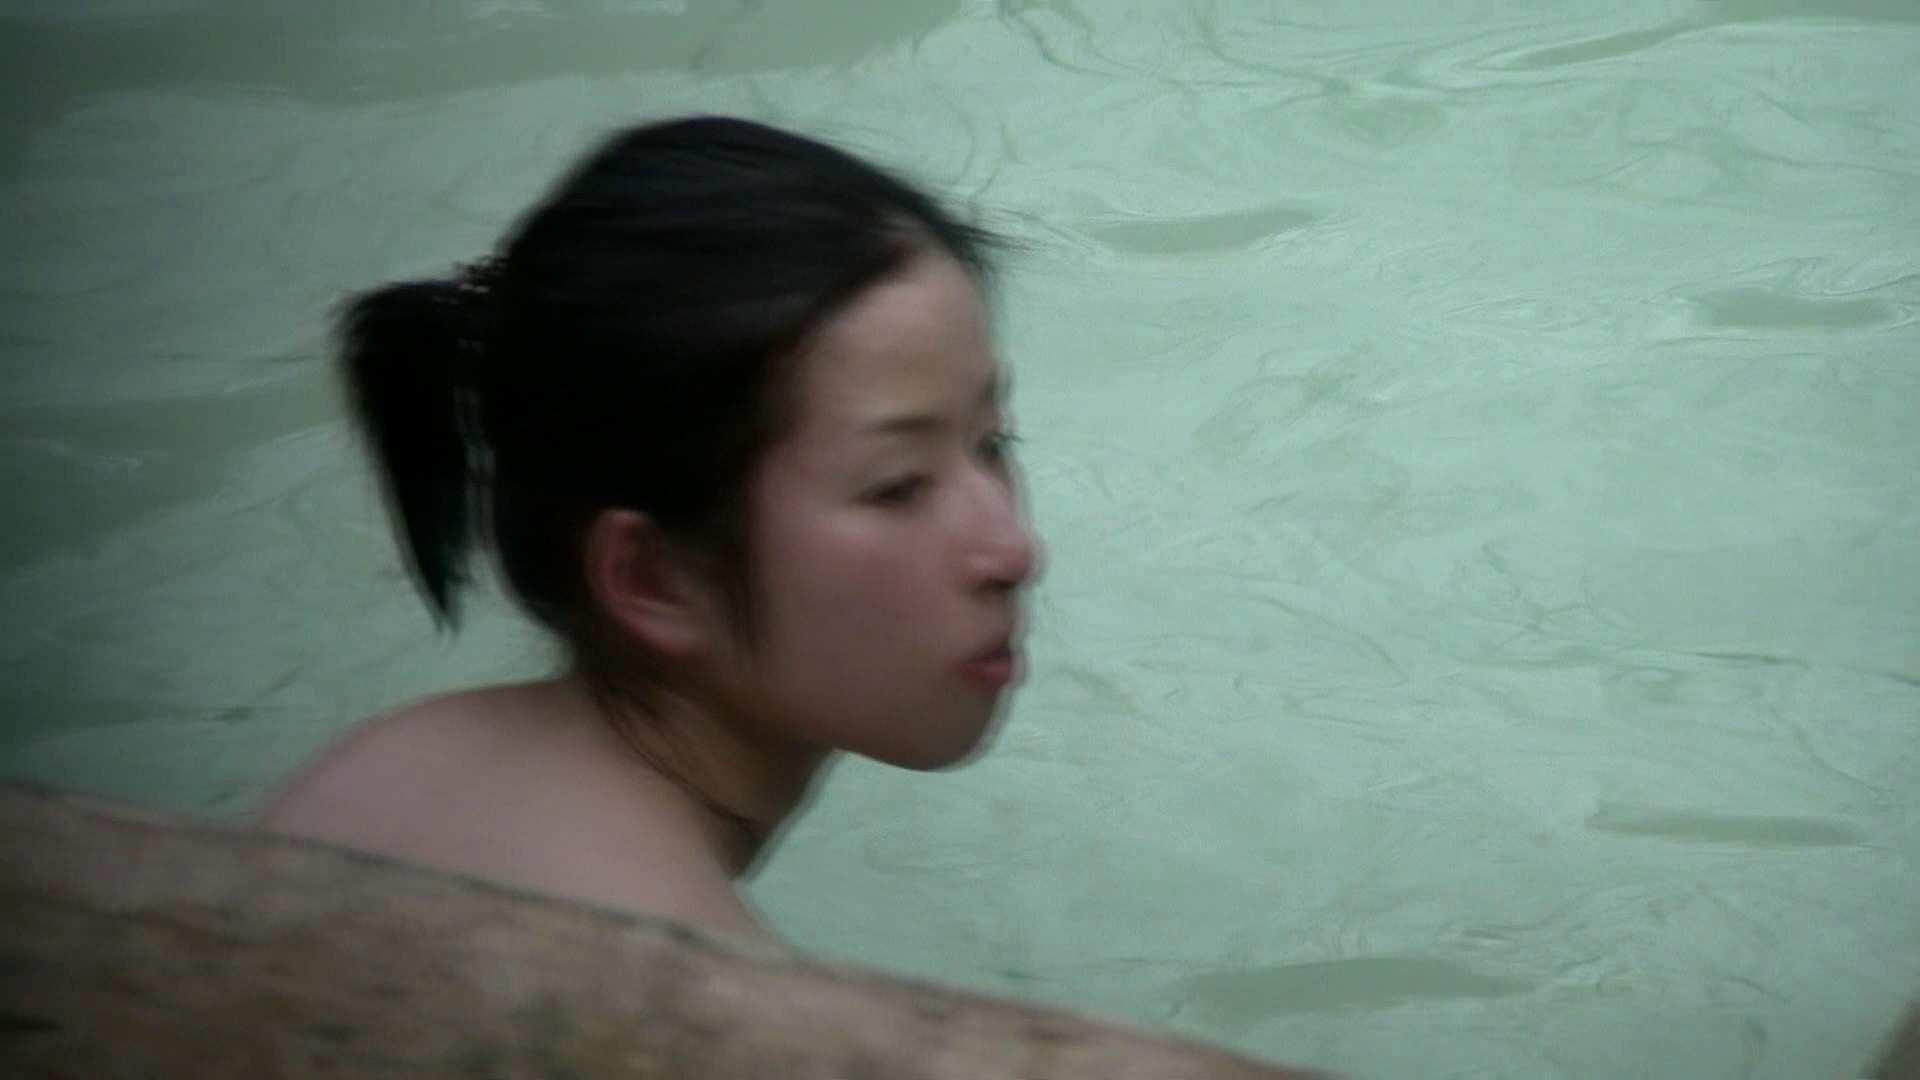 Aquaな露天風呂Vol.656 露天風呂編 | 盗撮シリーズ  91PIX 33